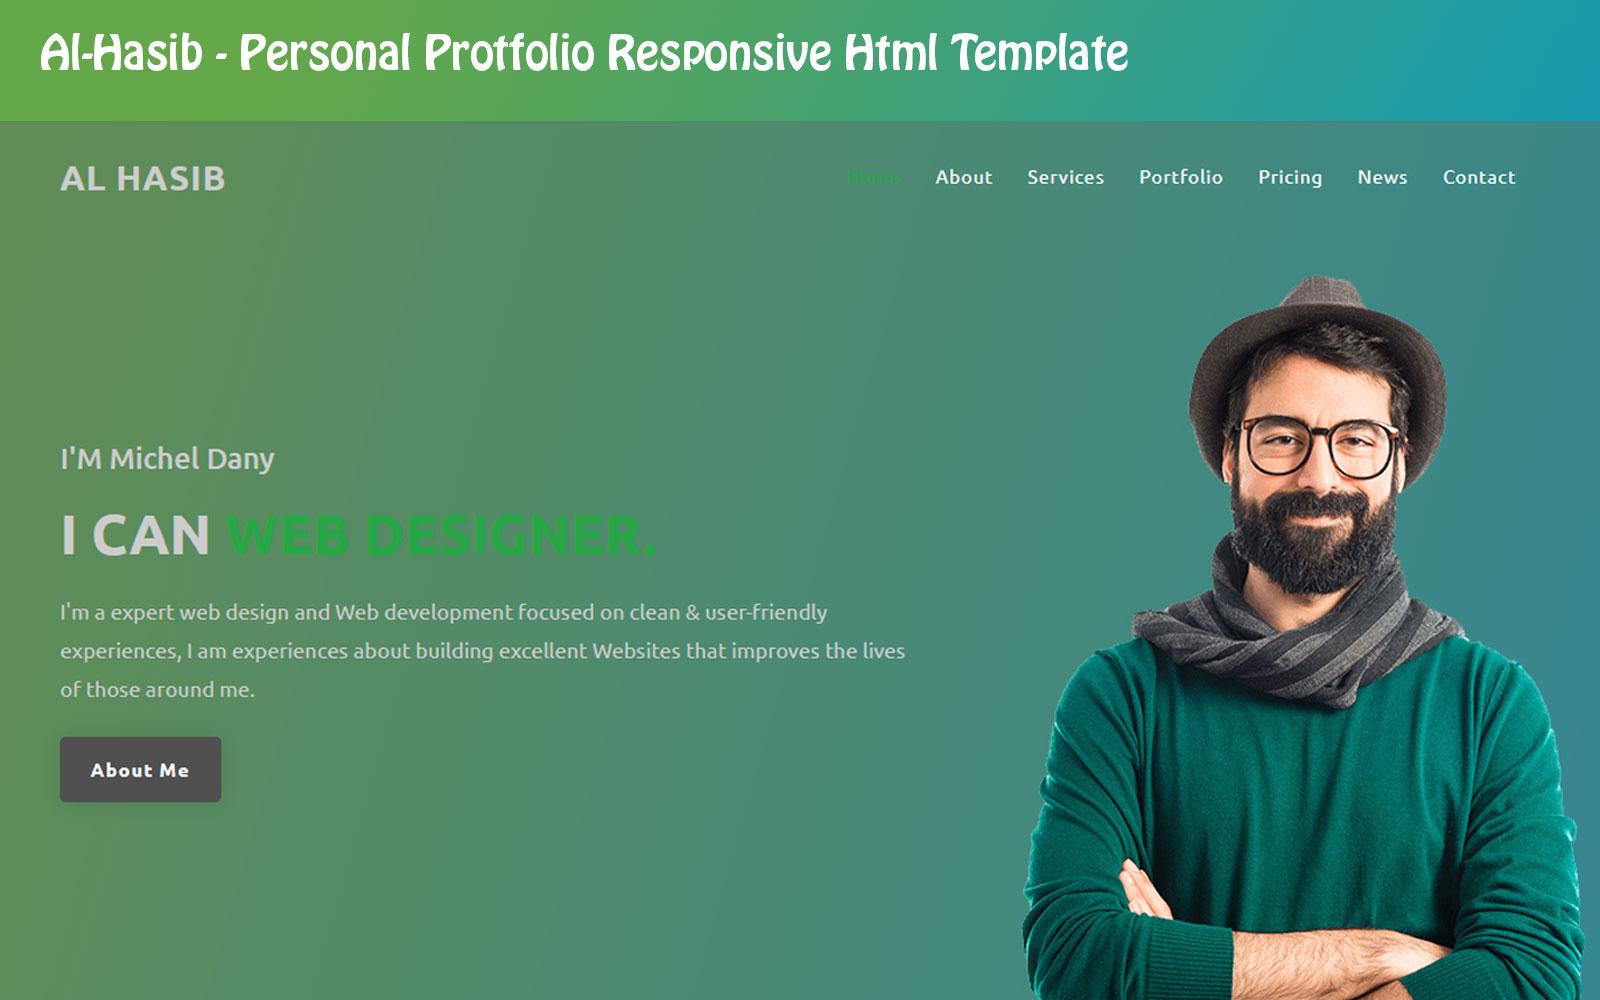 Al-Hasib - Personal Portfolio Html Landing Page Template